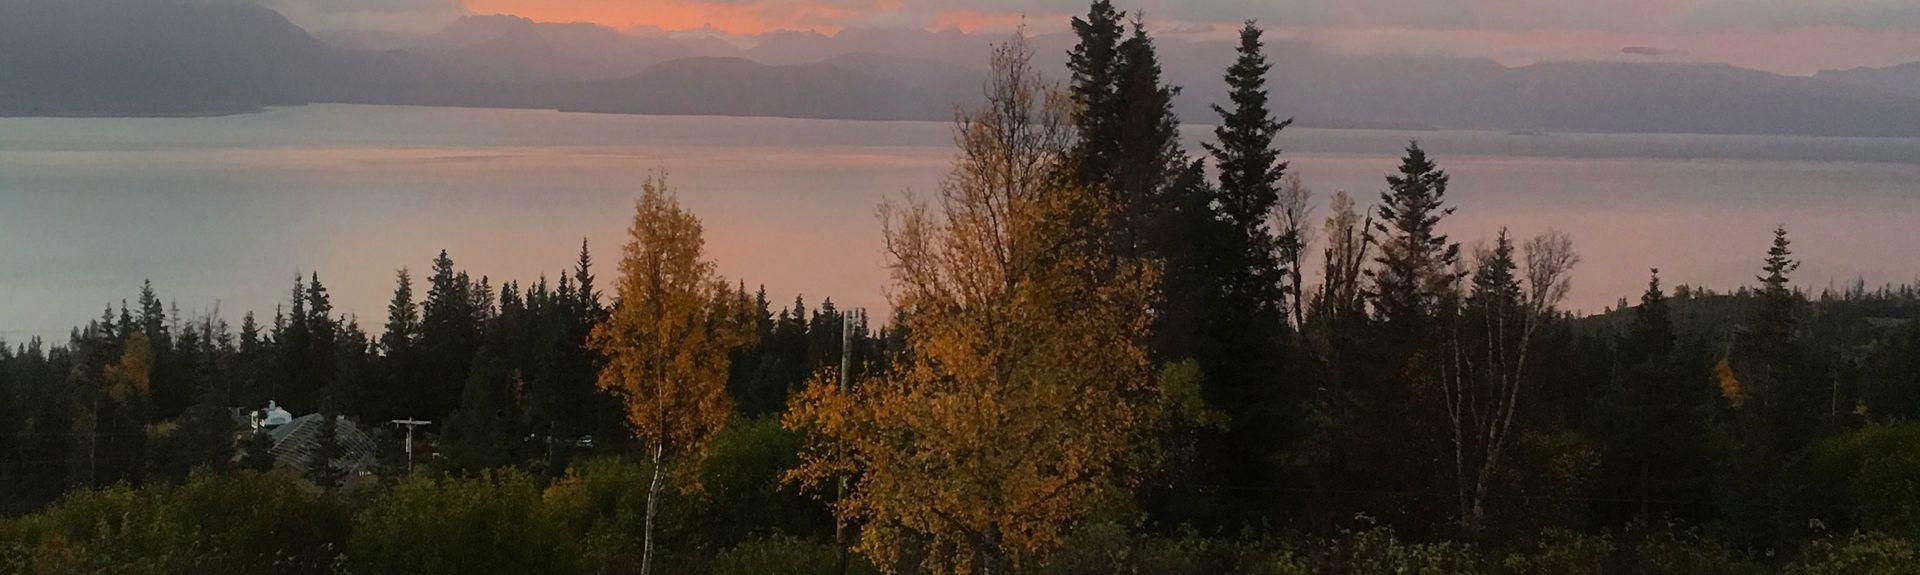 Homer, Alaska, Estados Unidos